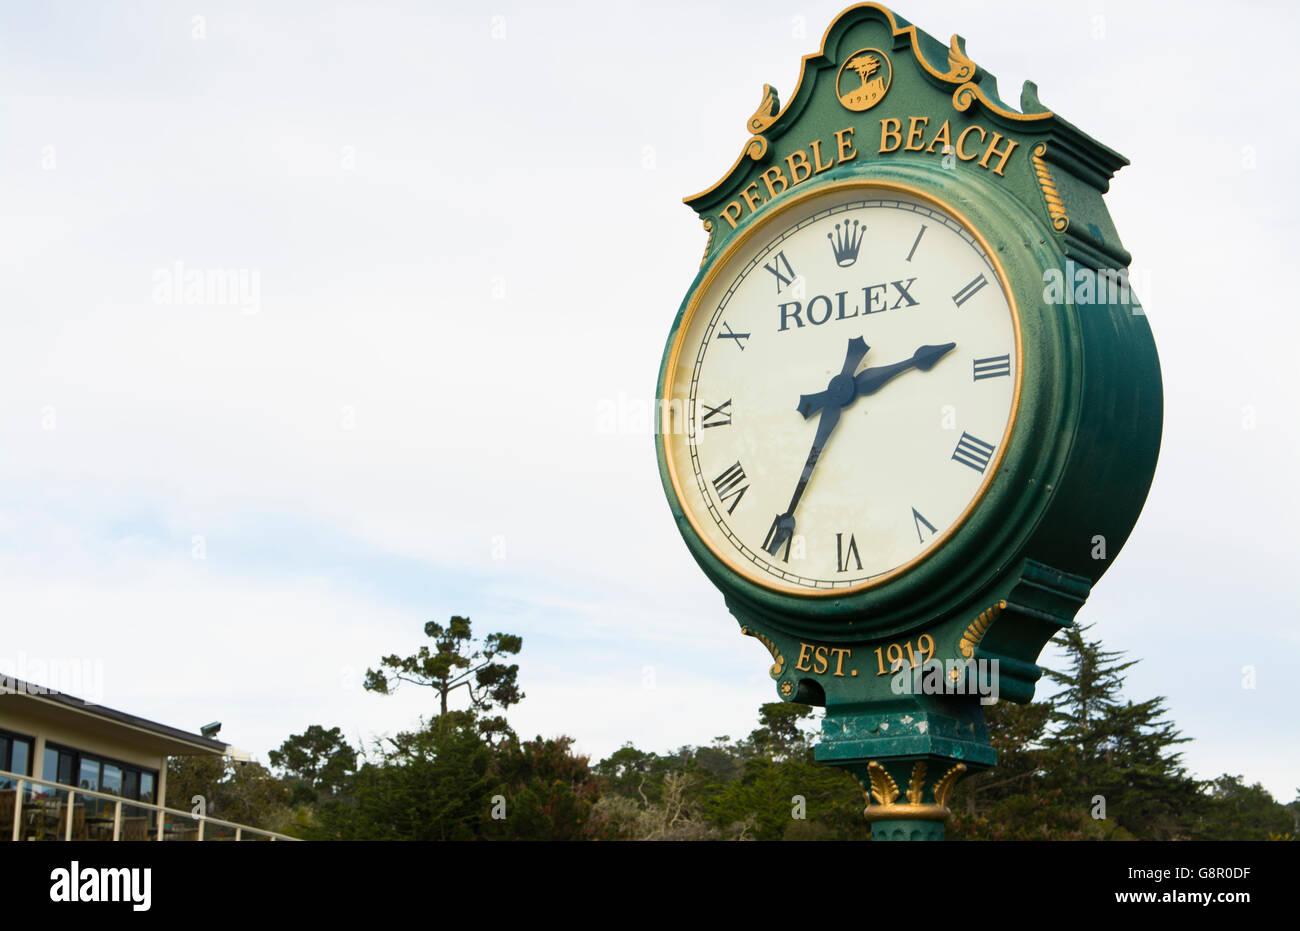 Pebble Beach California clock at Pebble Beach Golf Links exclusive golf course - Stock Image